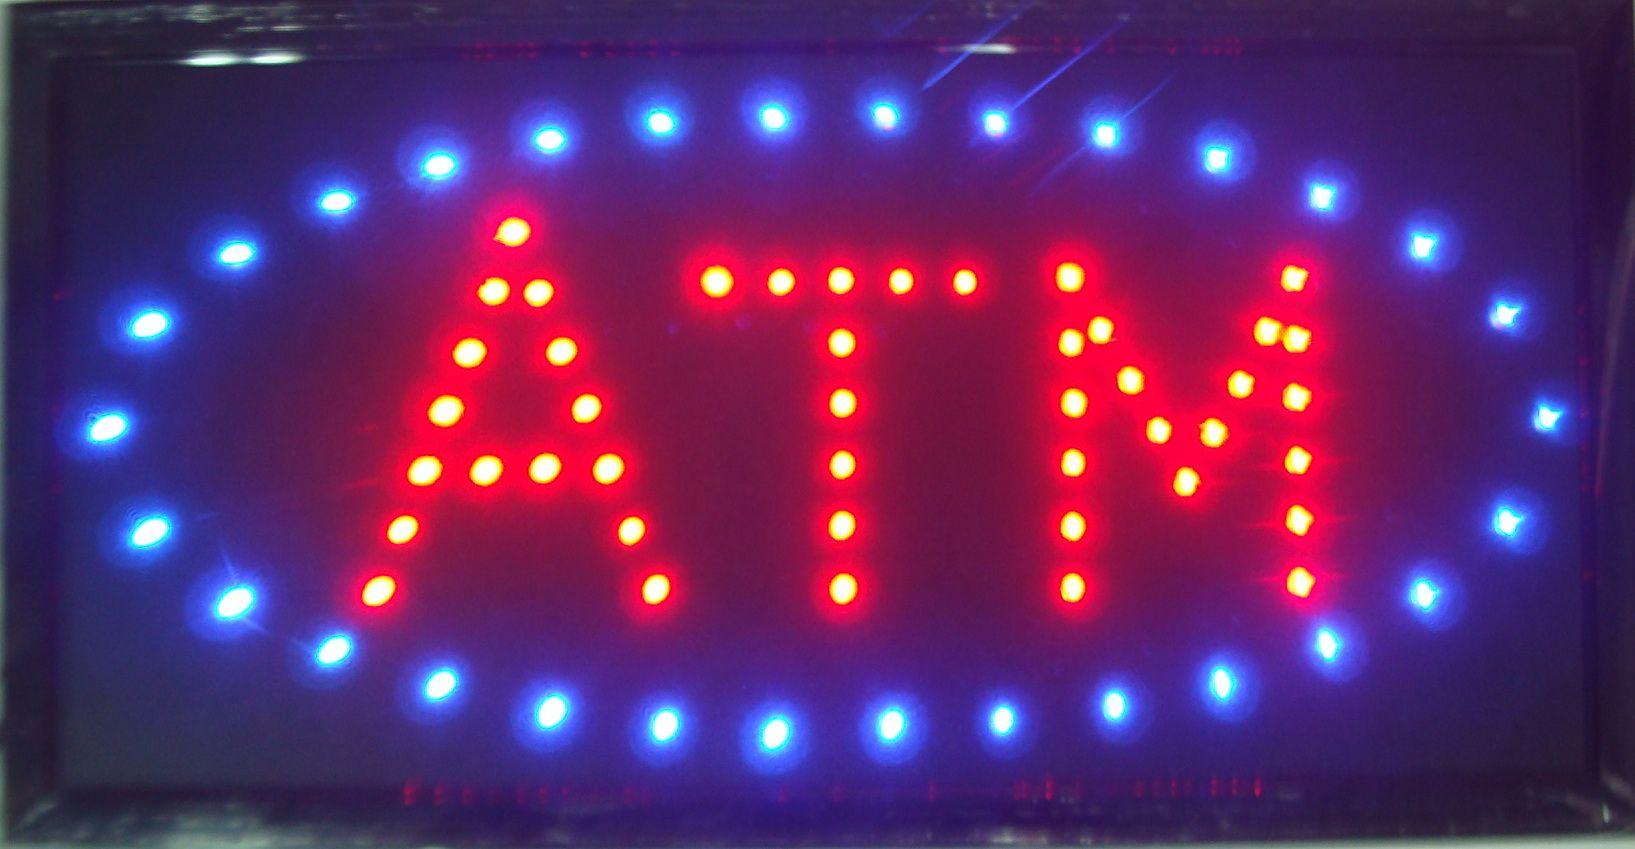 LED ATM 네온 사인 뜨거운 판매 사용자 지정 led 기호 10 x 19 인치 반 - 야외 매우 밝은 ATM 표시